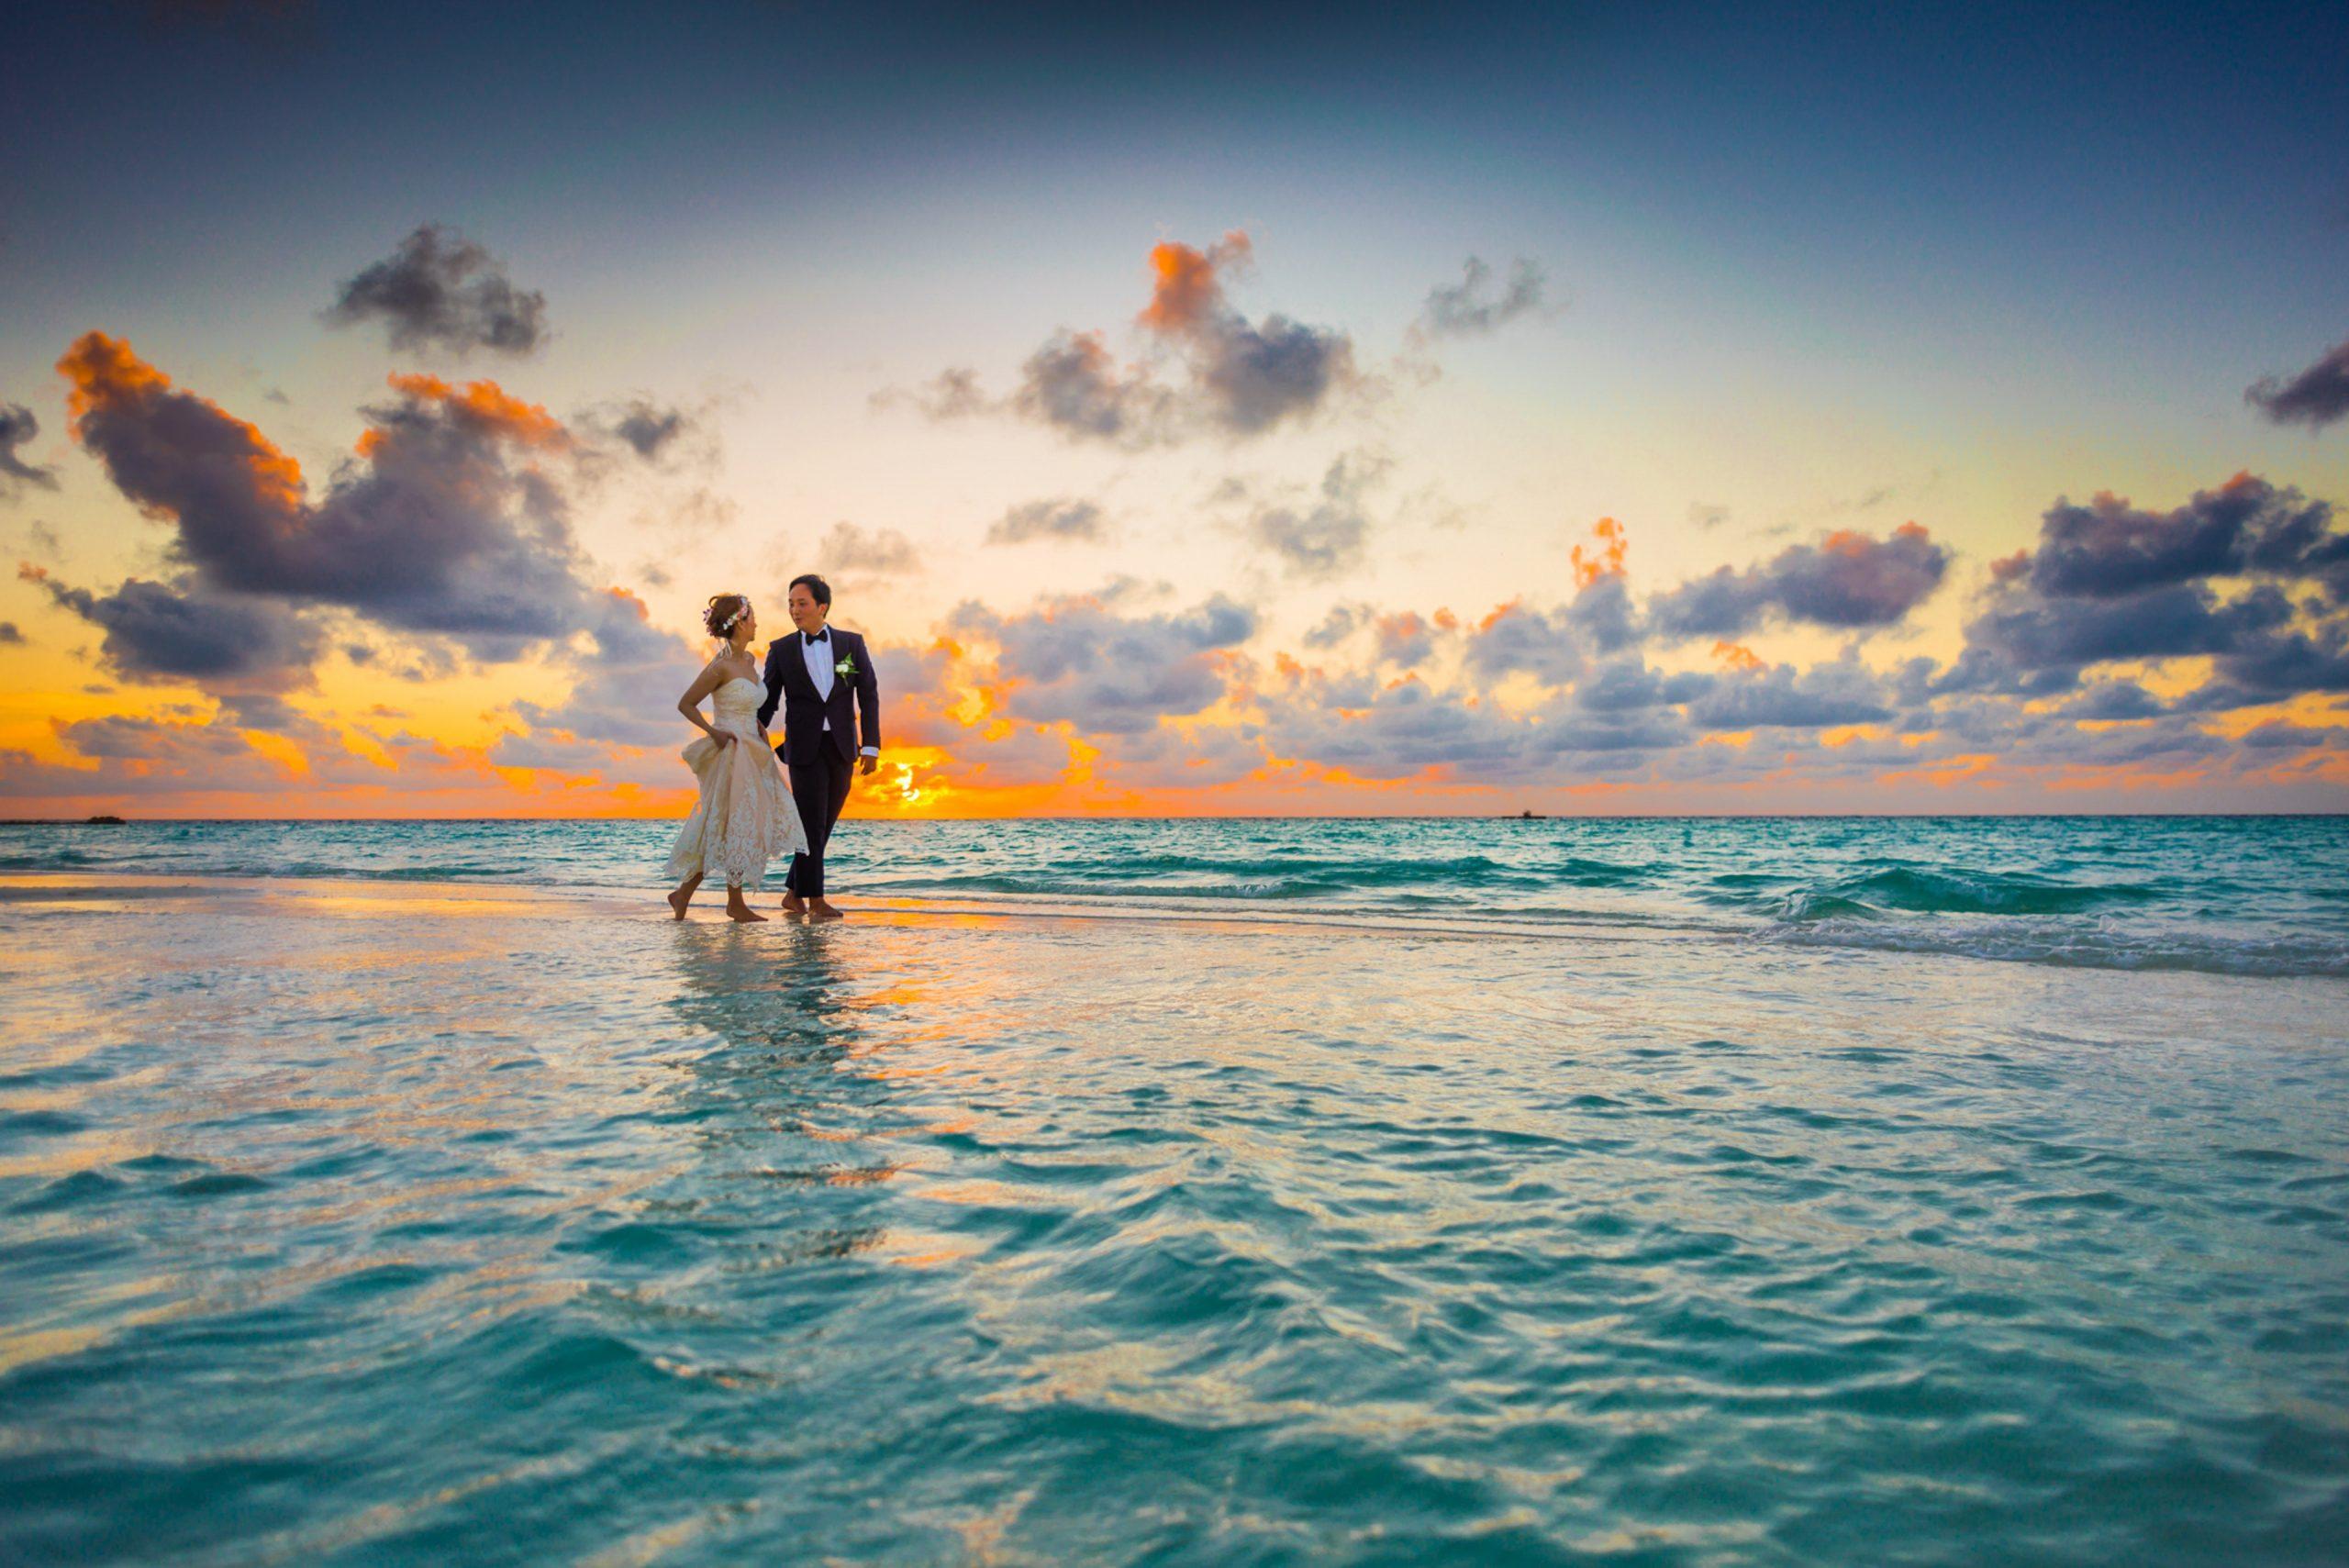 honeymoon tour in bali